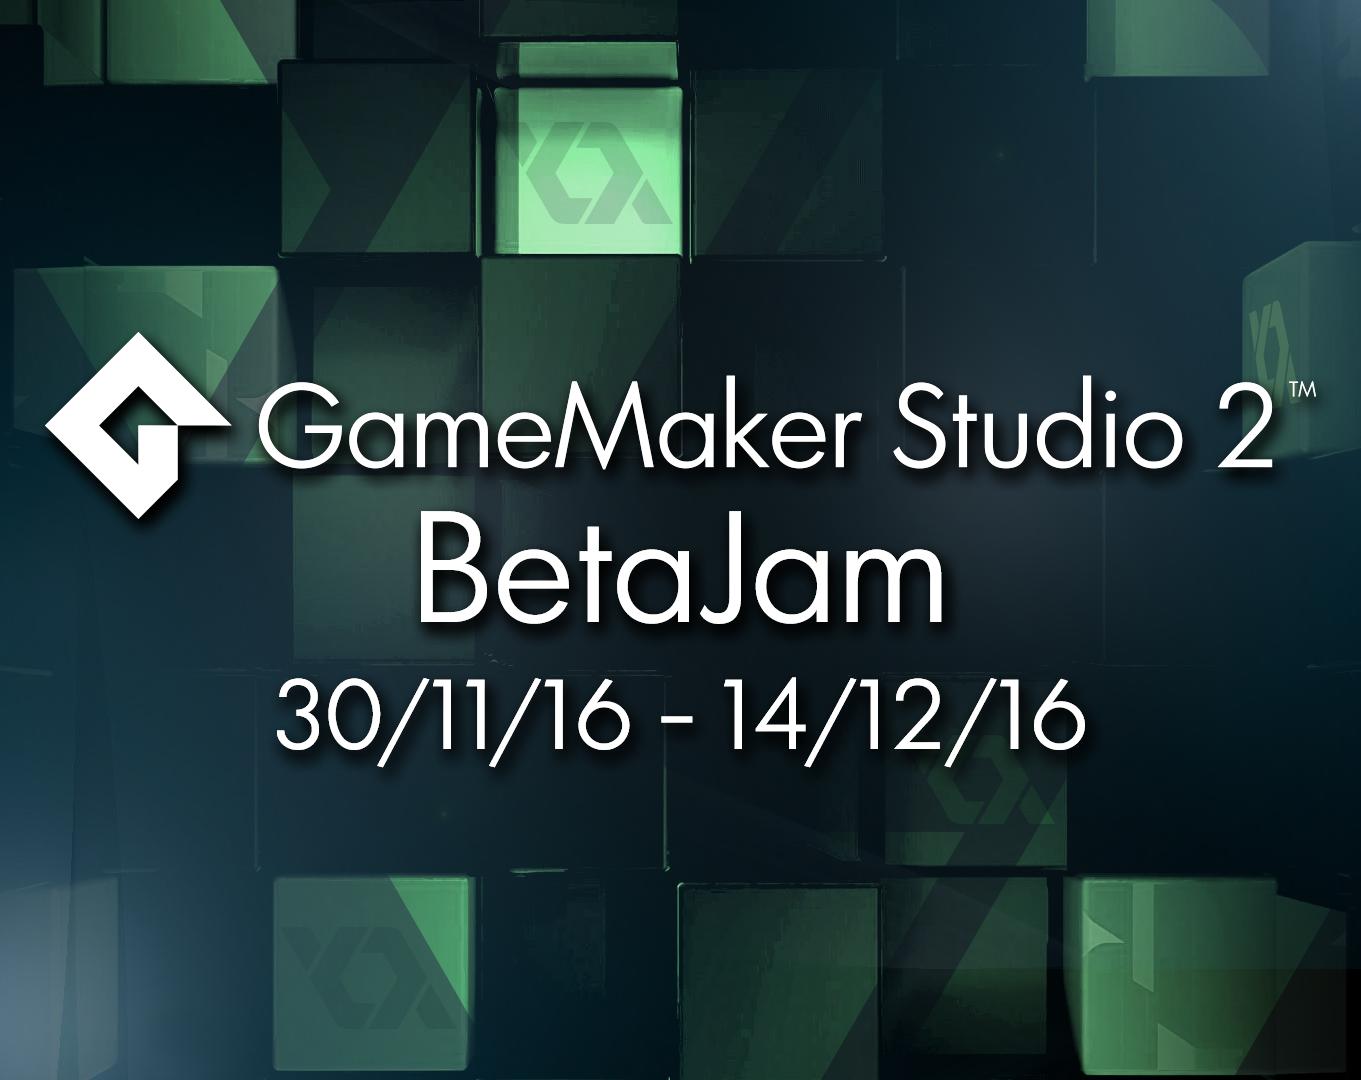 GameMaker Studio 2 - Beta Jam - itch io